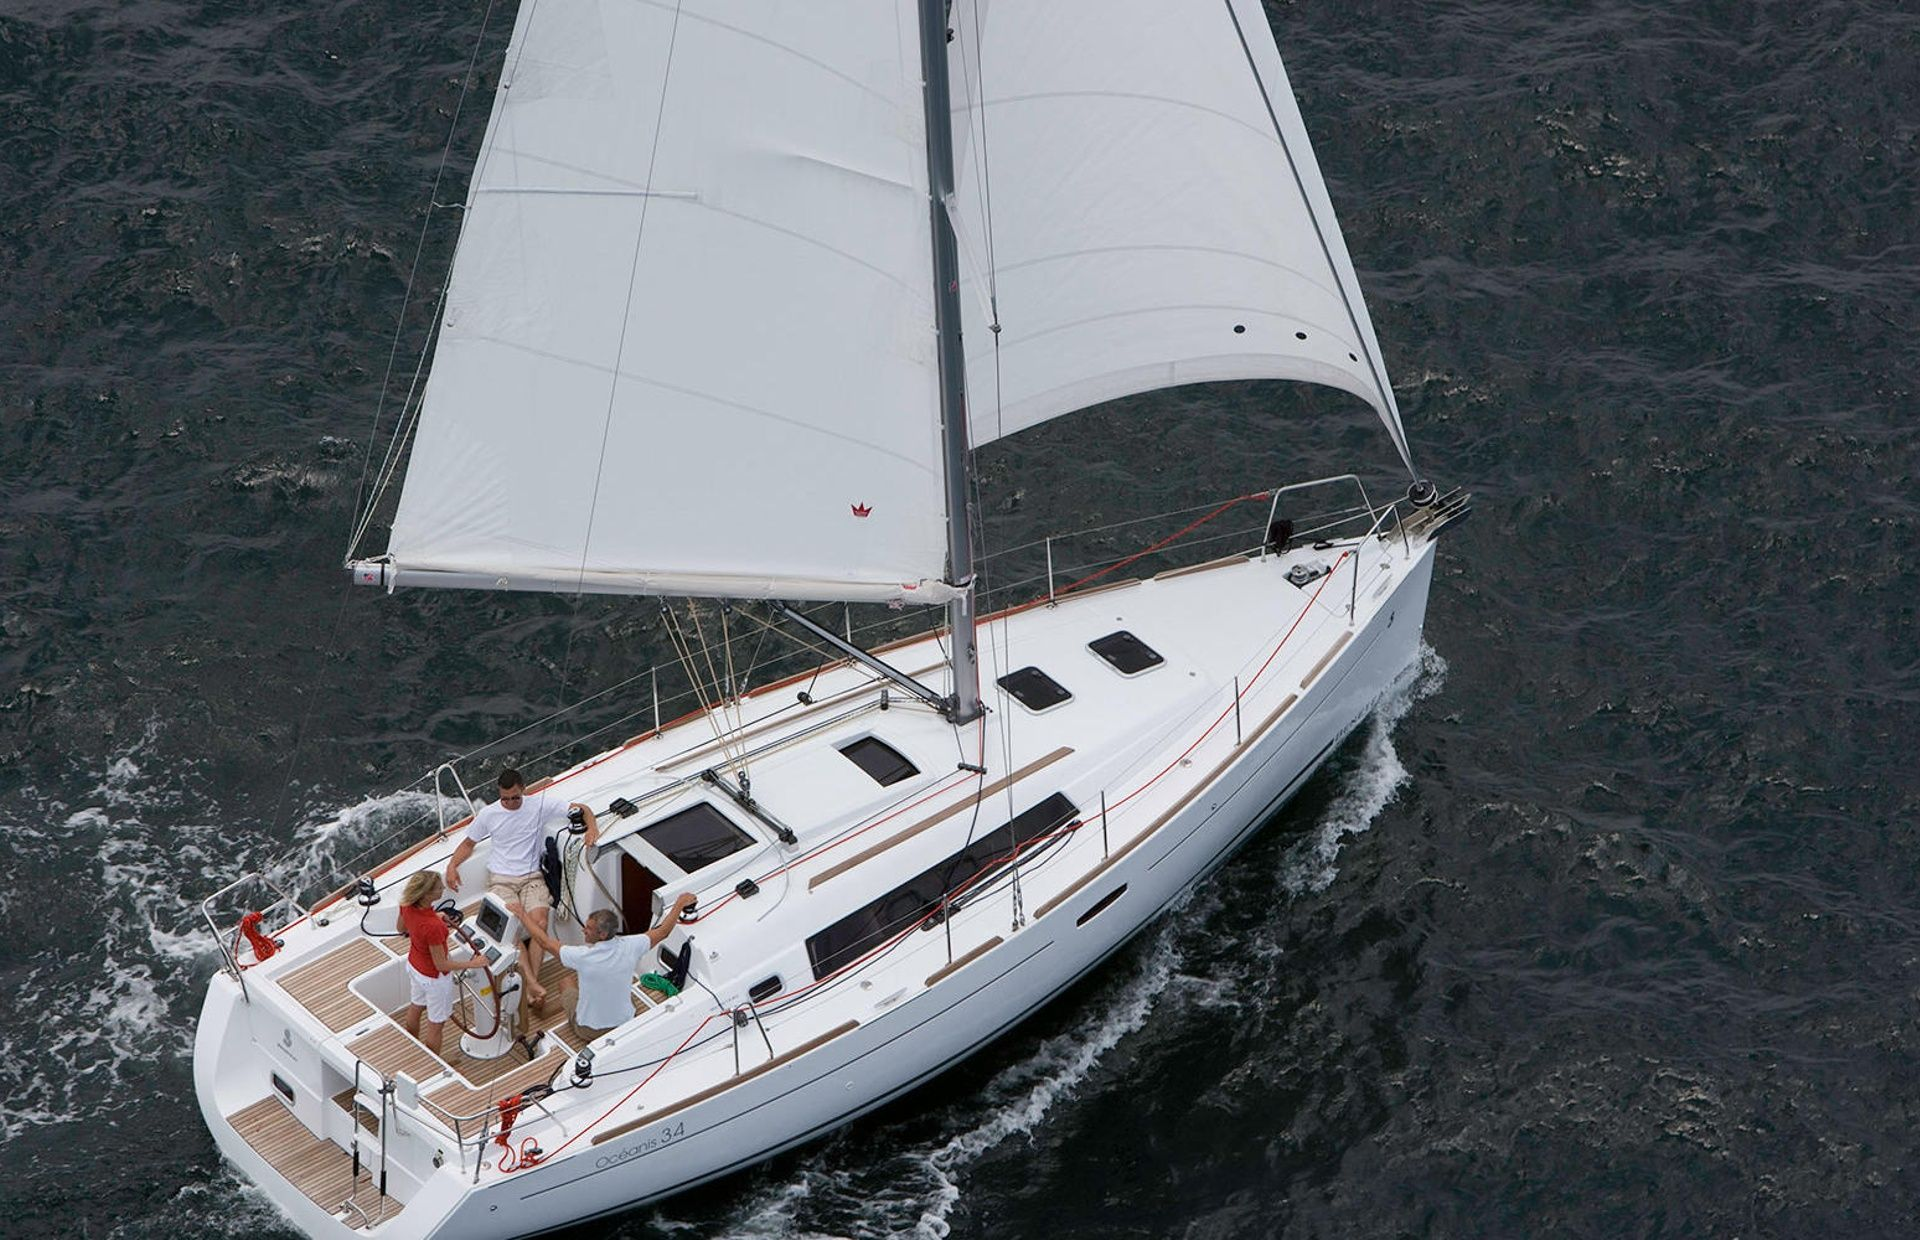 https://media.insailing.com/boat/oceanis-34/image_1567608188535.jpg